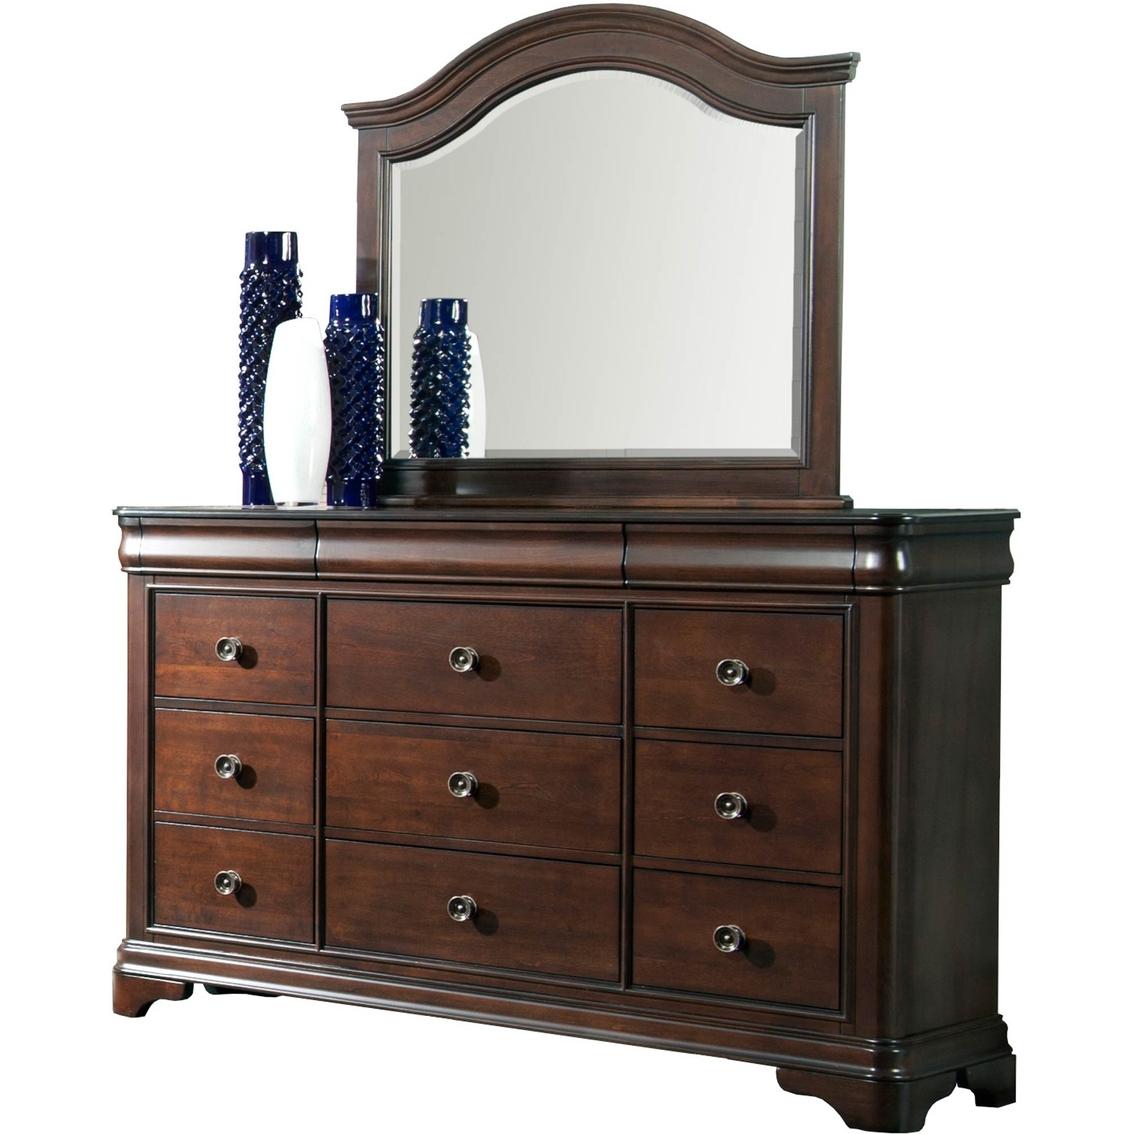 Elements cameron dresser and mirror set dressers home appliances shop the exchange Elements cameron bedroom set